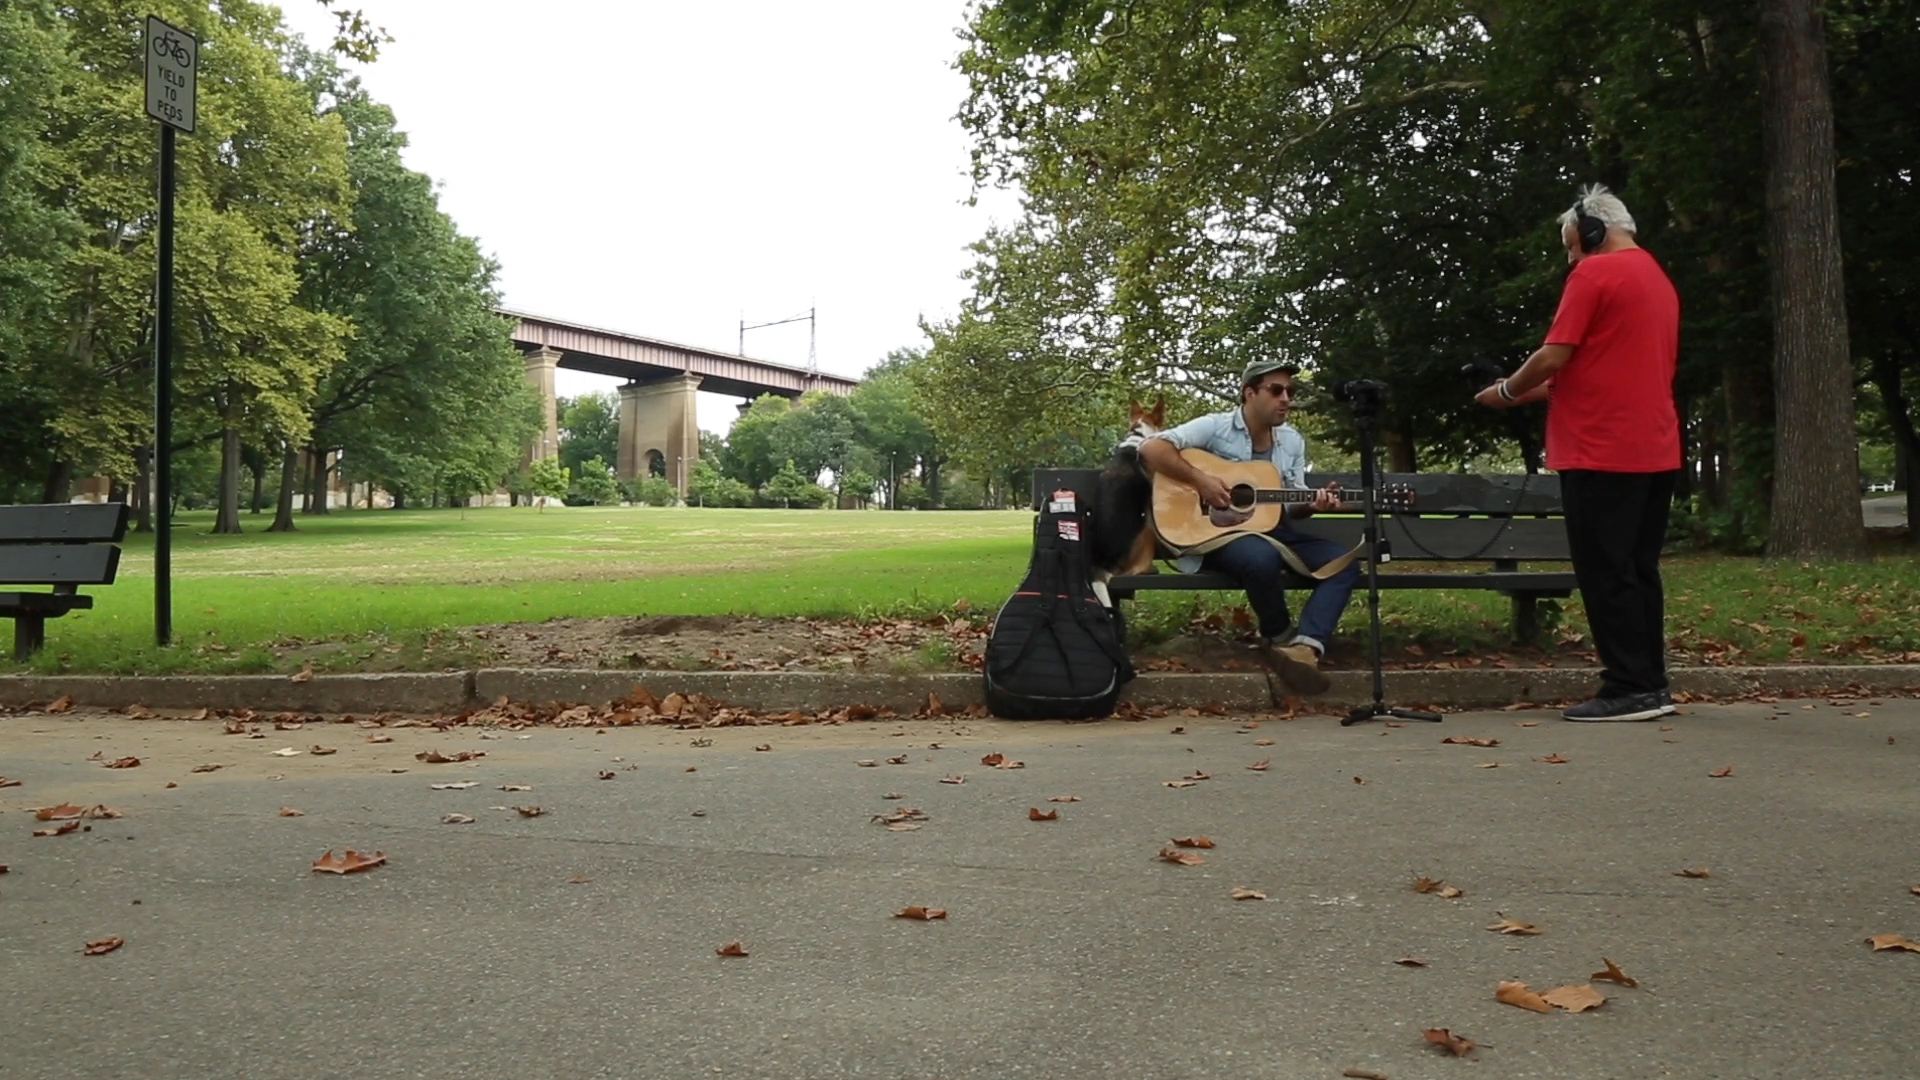 Brick with Matt Sucich in Astoria Park in Queens.